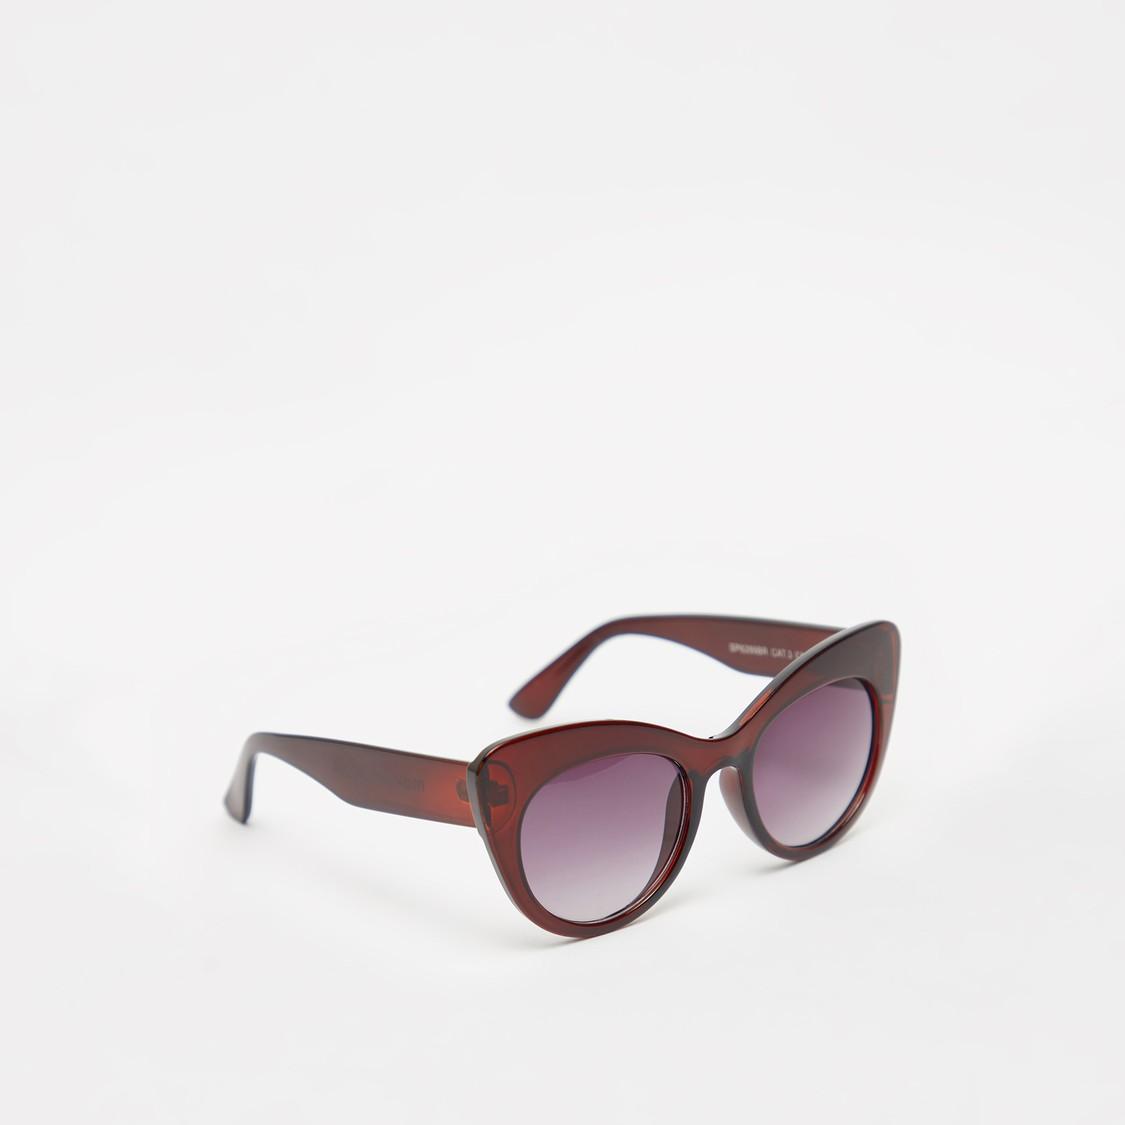 Full Rim Cat-Eye Sunglasses